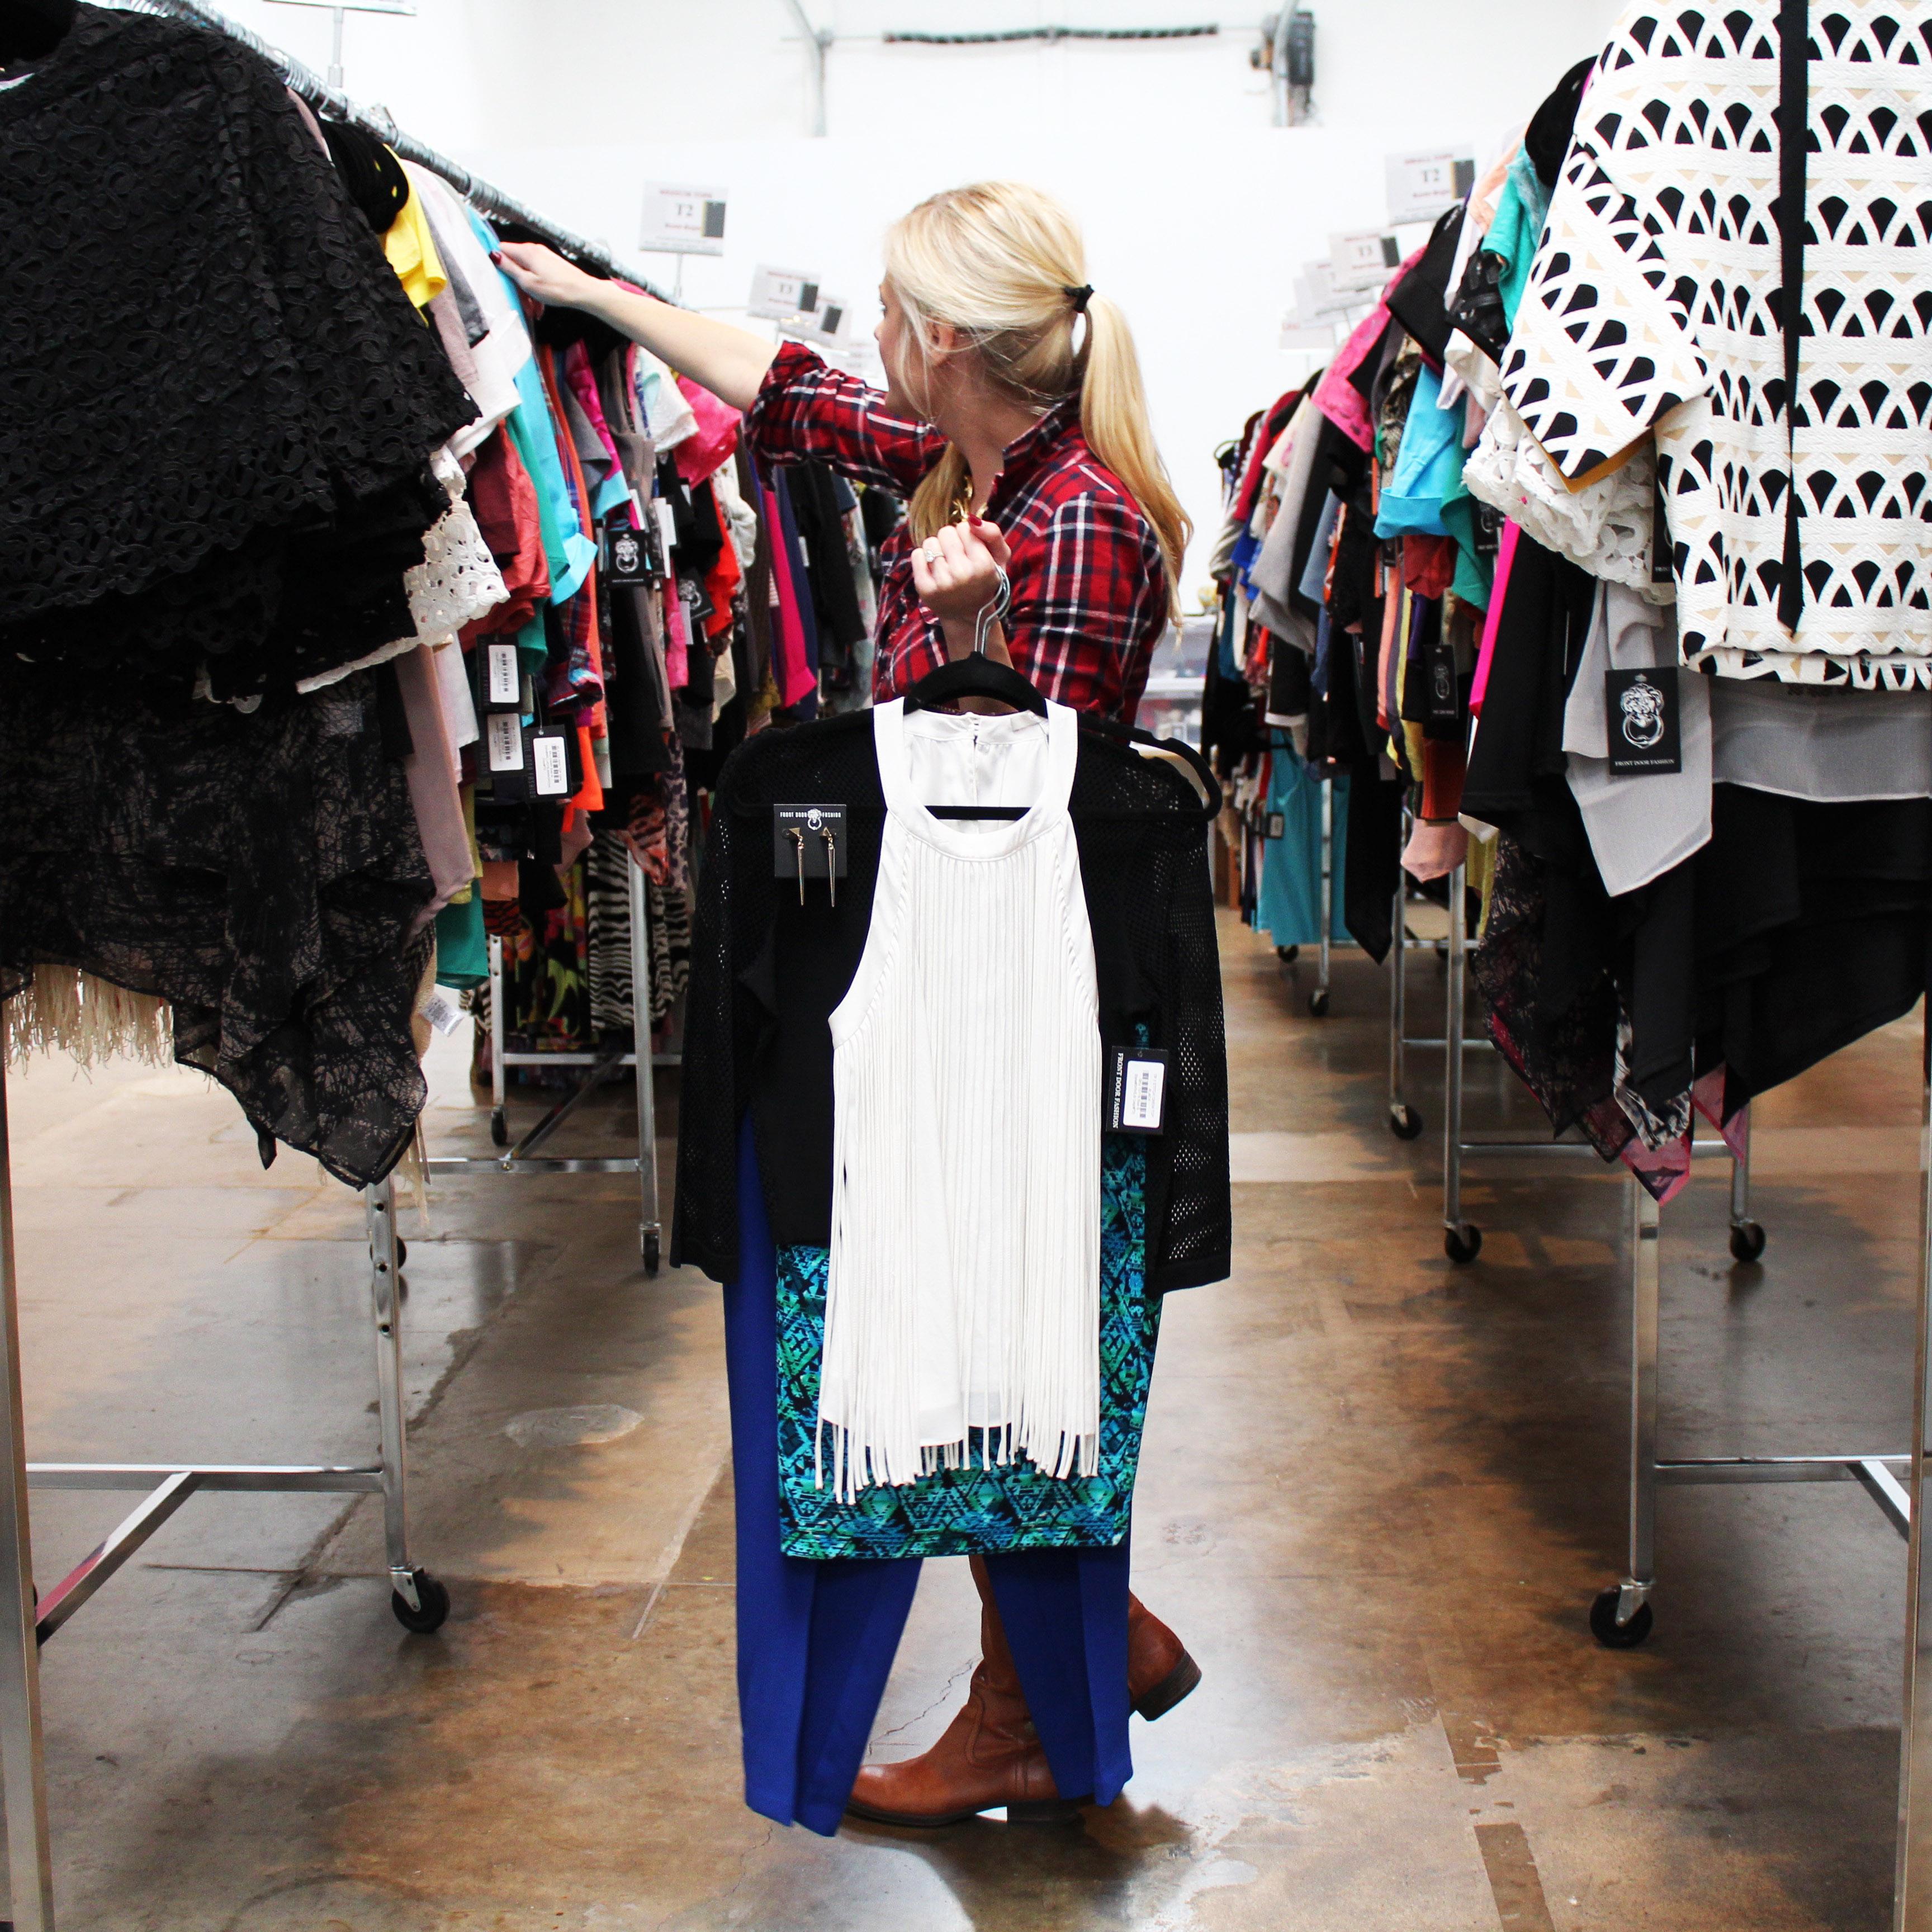 Front Door Fashion Stylist, Erika Styling her customer